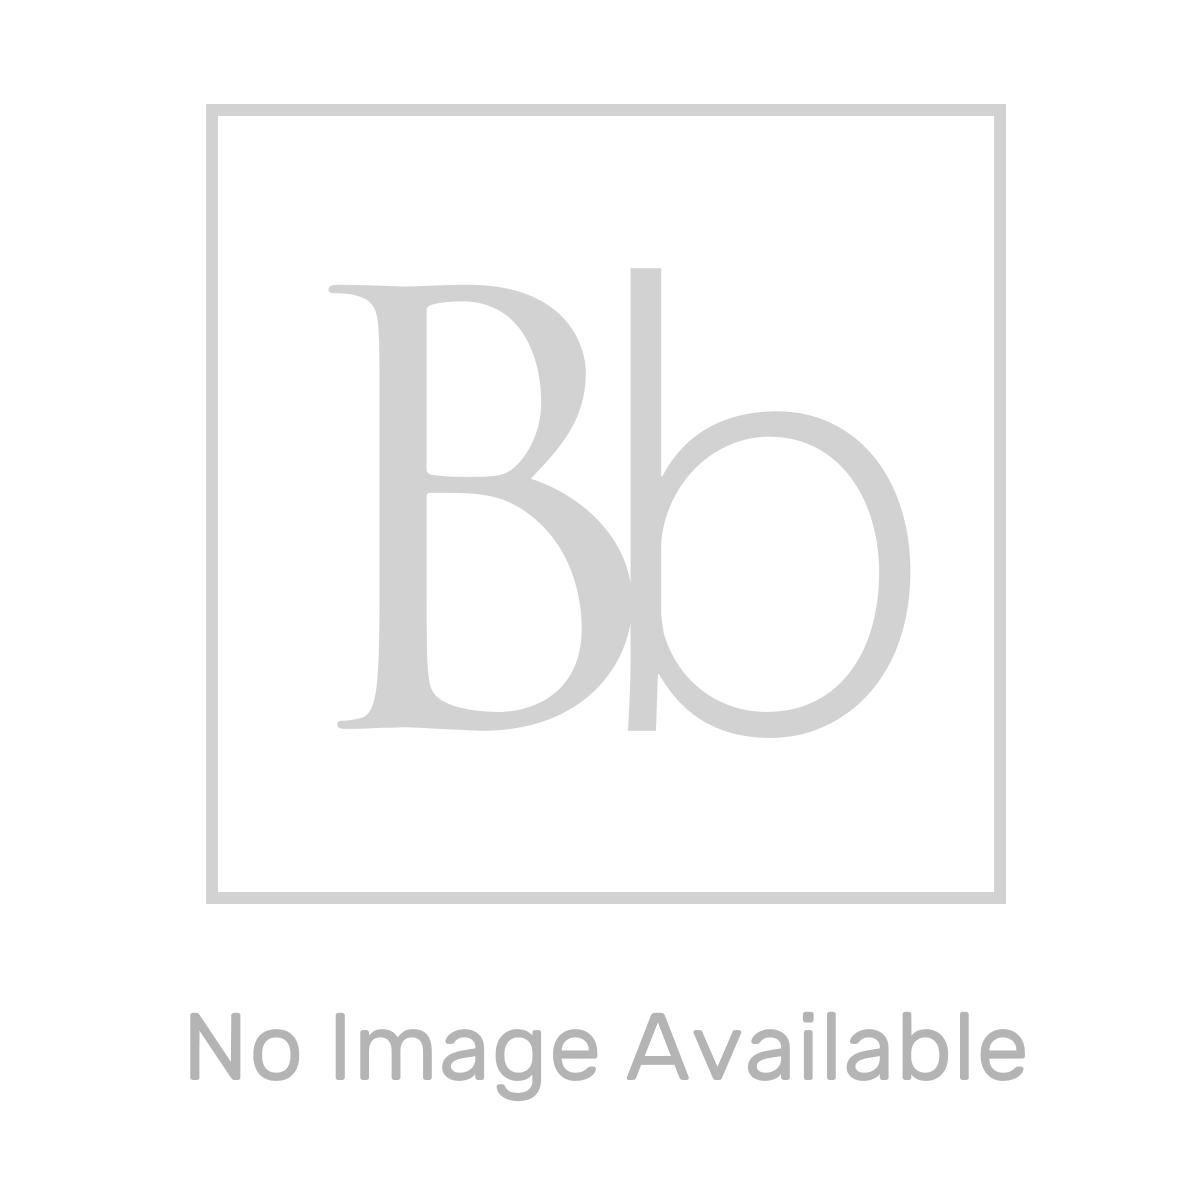 Nuie Athena Hacienda Black 2 Drawer Floor Standing Vanity Unit with 50mm Profile Basin 800mm Line Drawing